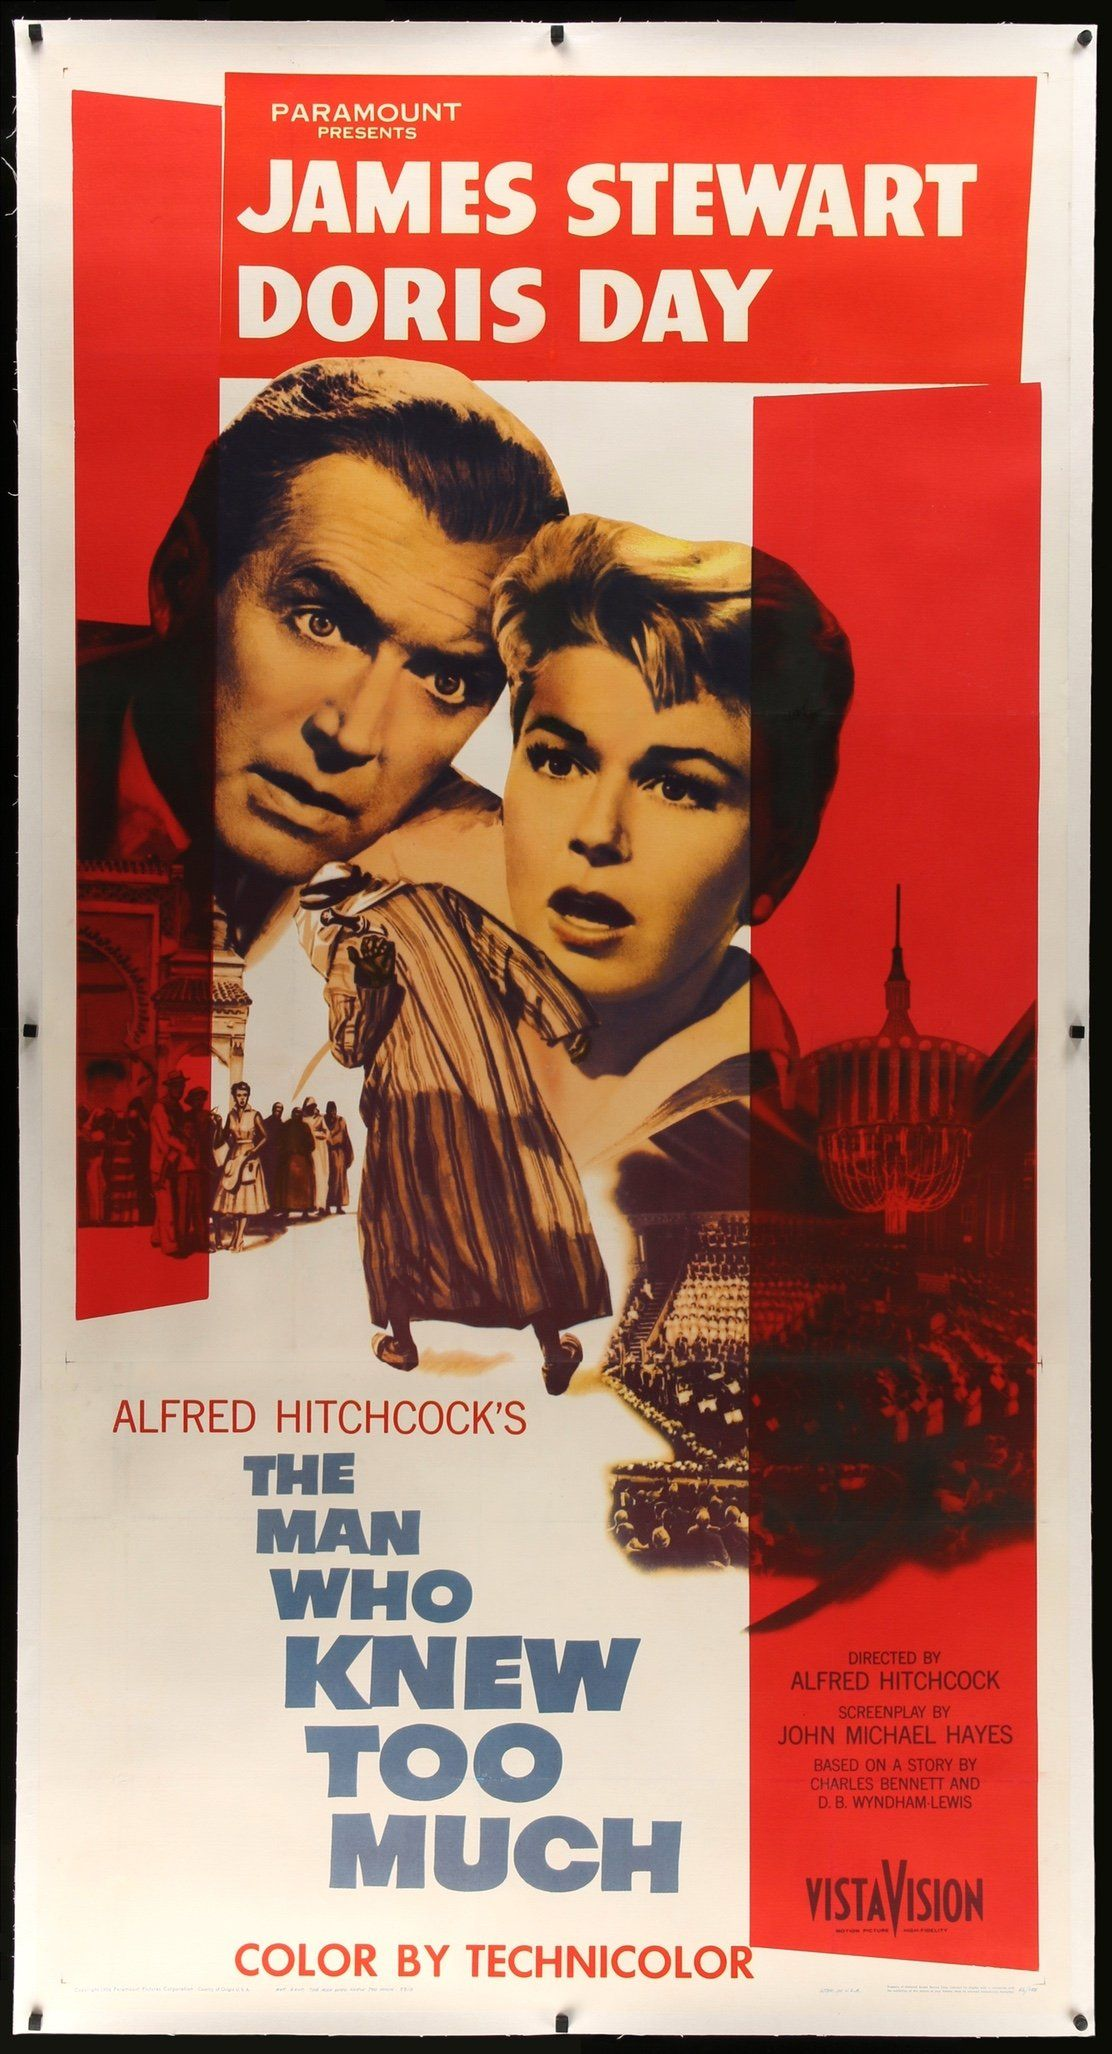 Casablanca Humphrey Bogart Belgian Vintage Film poster reproduction.